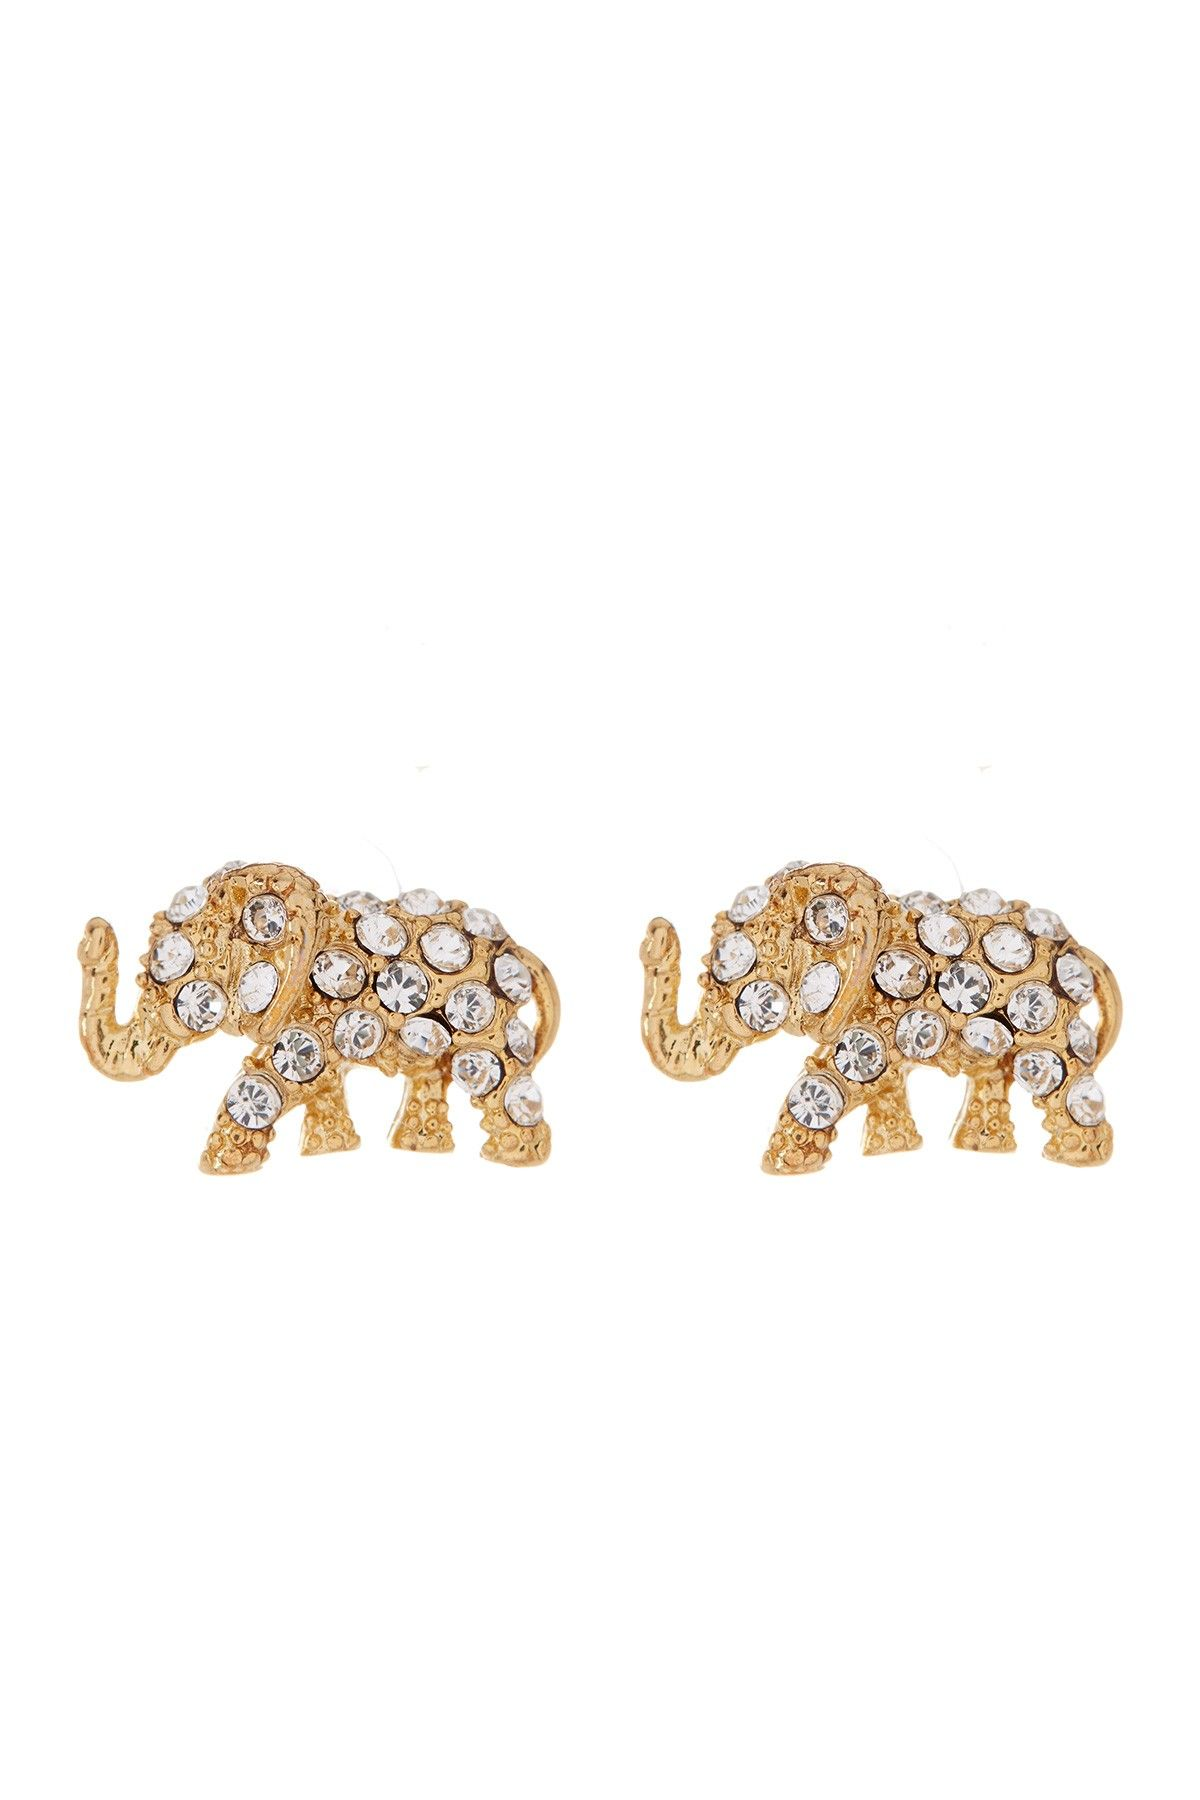 Pave Elephant Stud Earrings By Kate Spade New York On Nordstrom Rack Earringsnordstrom Rackelephantkate